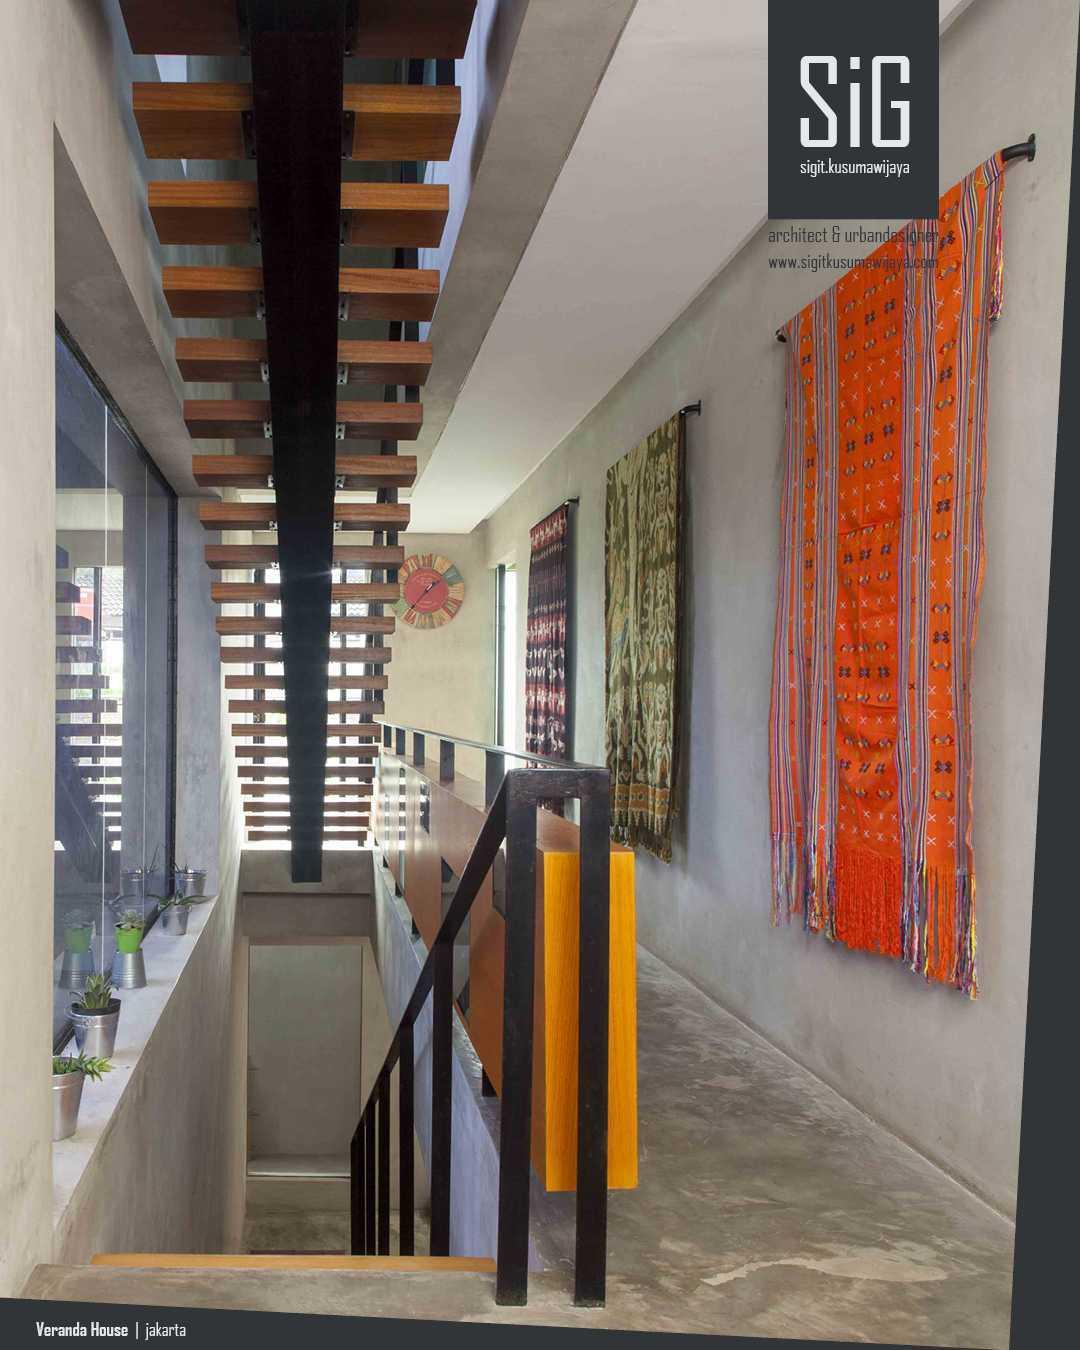 Foto inspirasi ide desain koridor dan lorong Sigitkusumawijaya-architect-urbandesigner-rumah-beranda-green-boarding-house oleh sigit.kusumawijaya | architect & urbandesigner di Arsitag